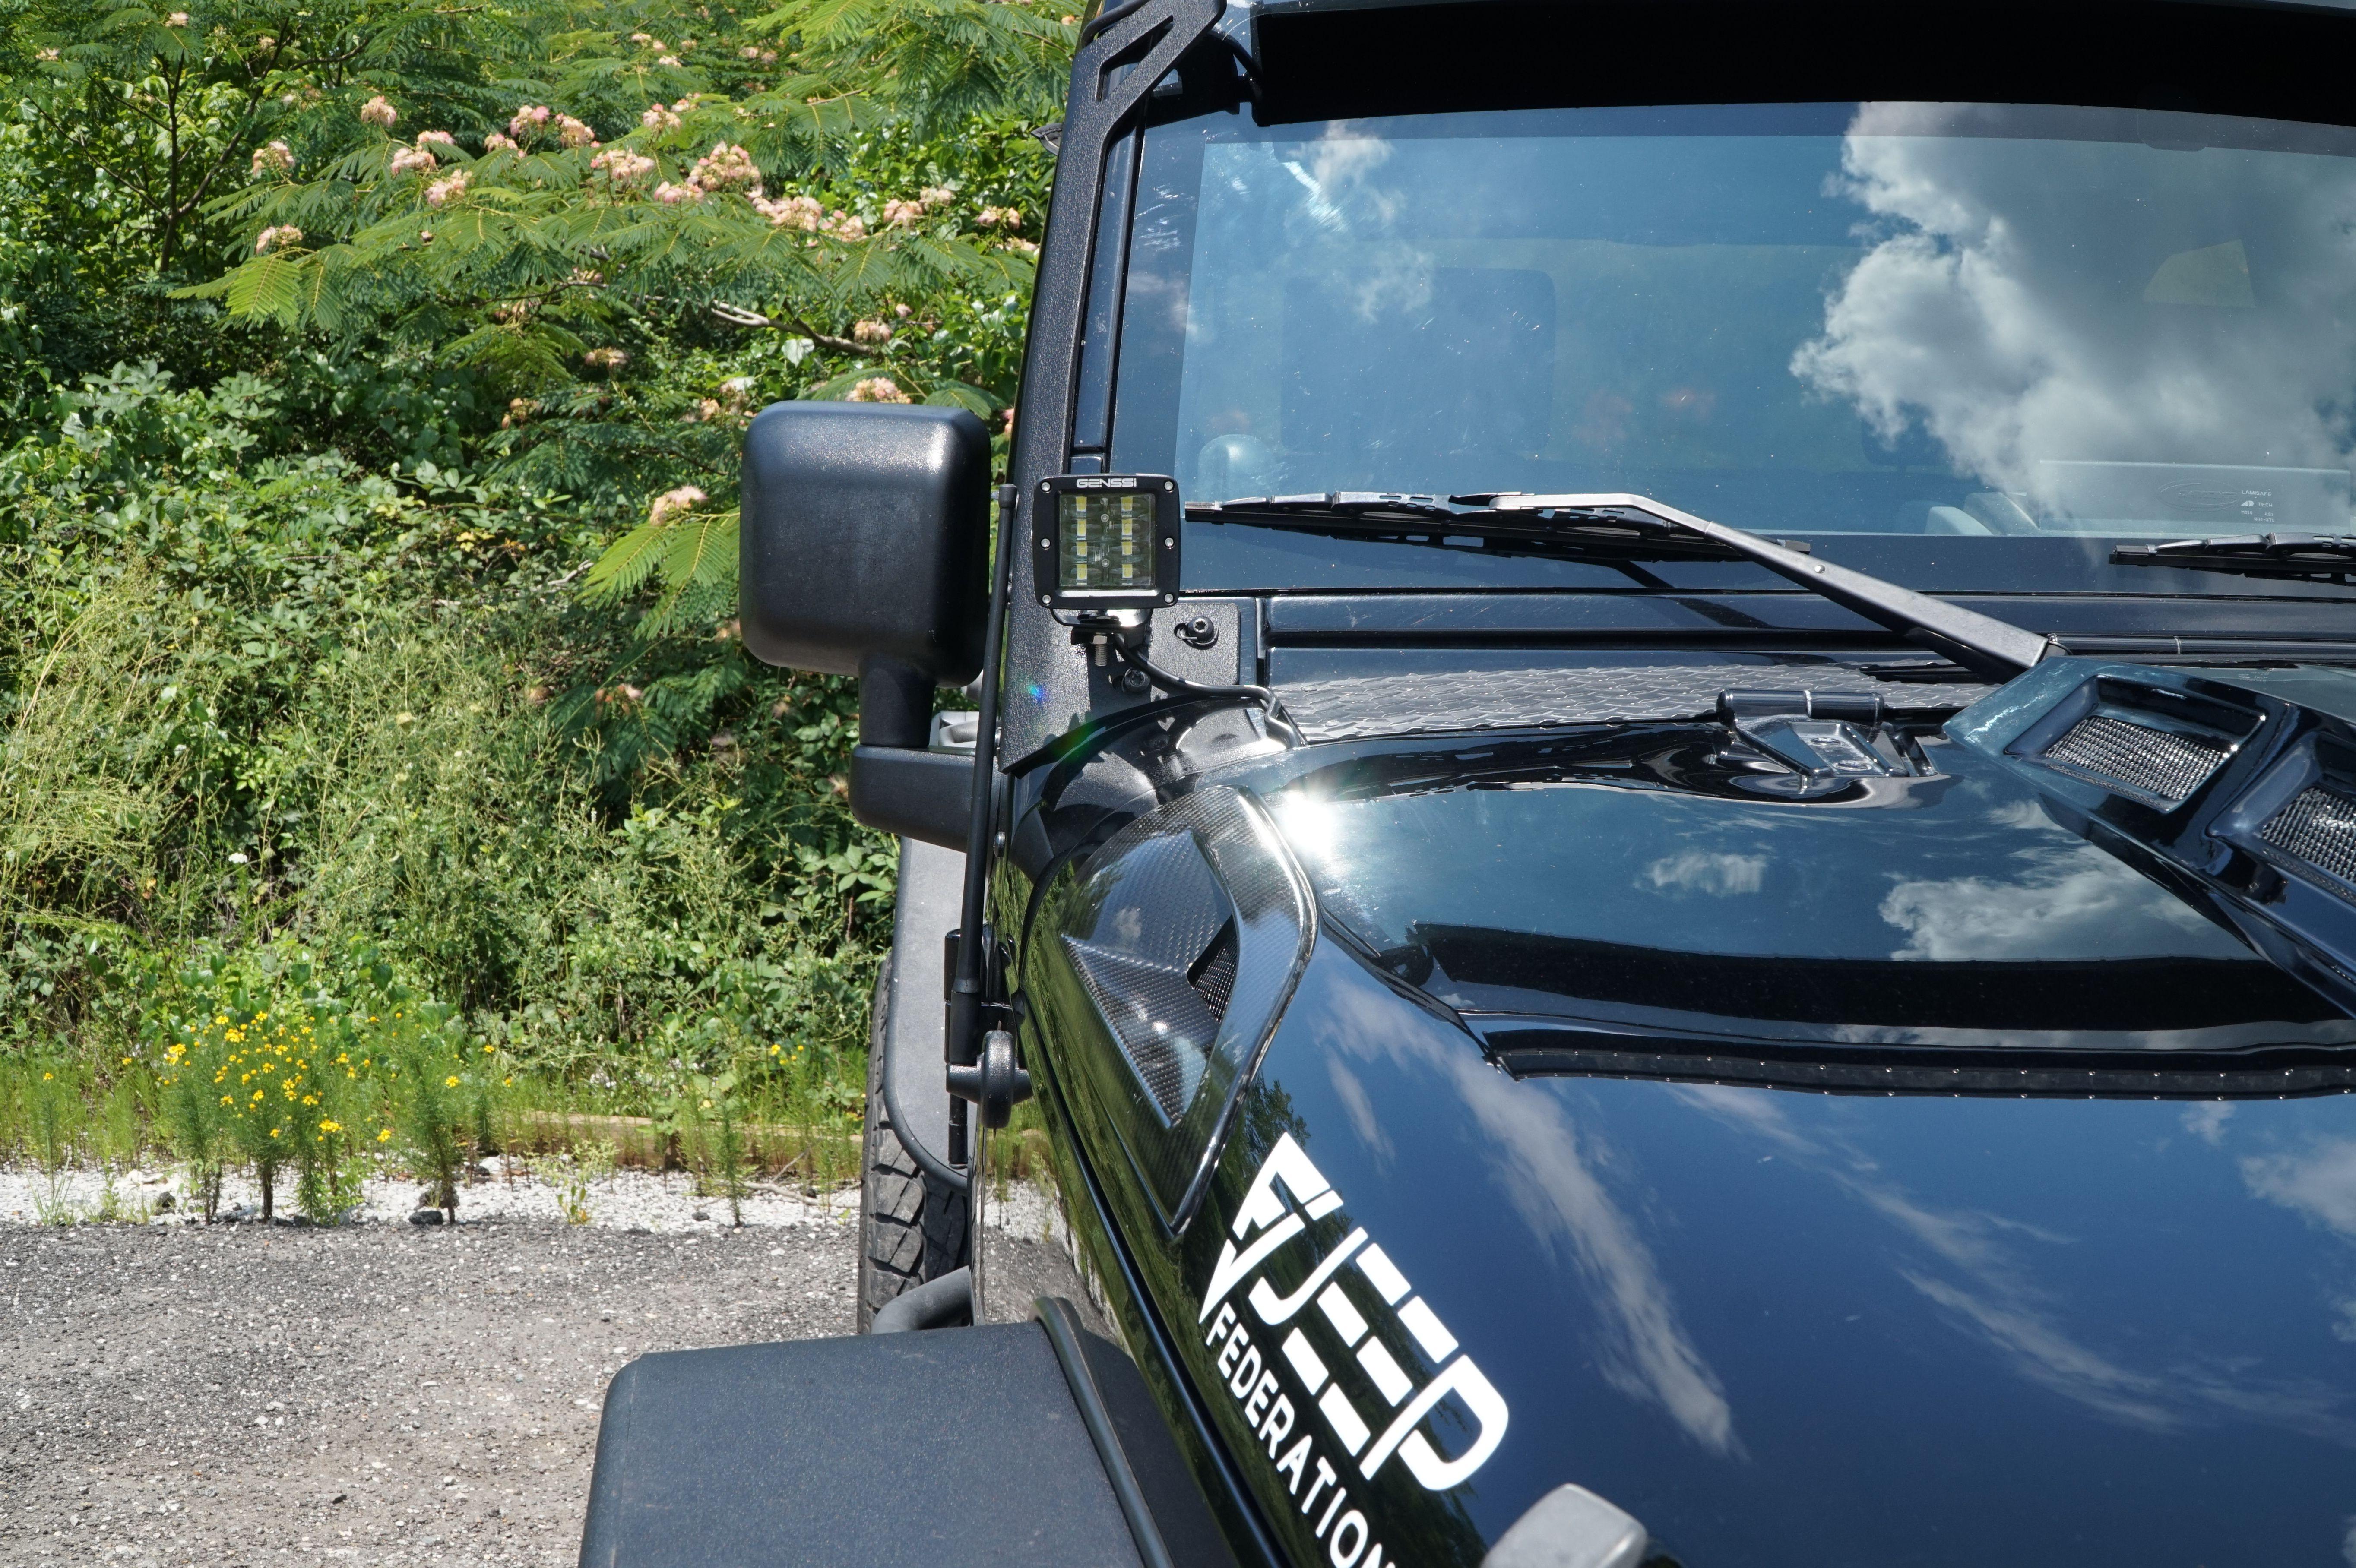 jeep federation led light bar set for jeep wrangler jk jeeplightbar jeepwranglerlight bar the best kit for your jk and jku lightbar [ 5456 x 3632 Pixel ]